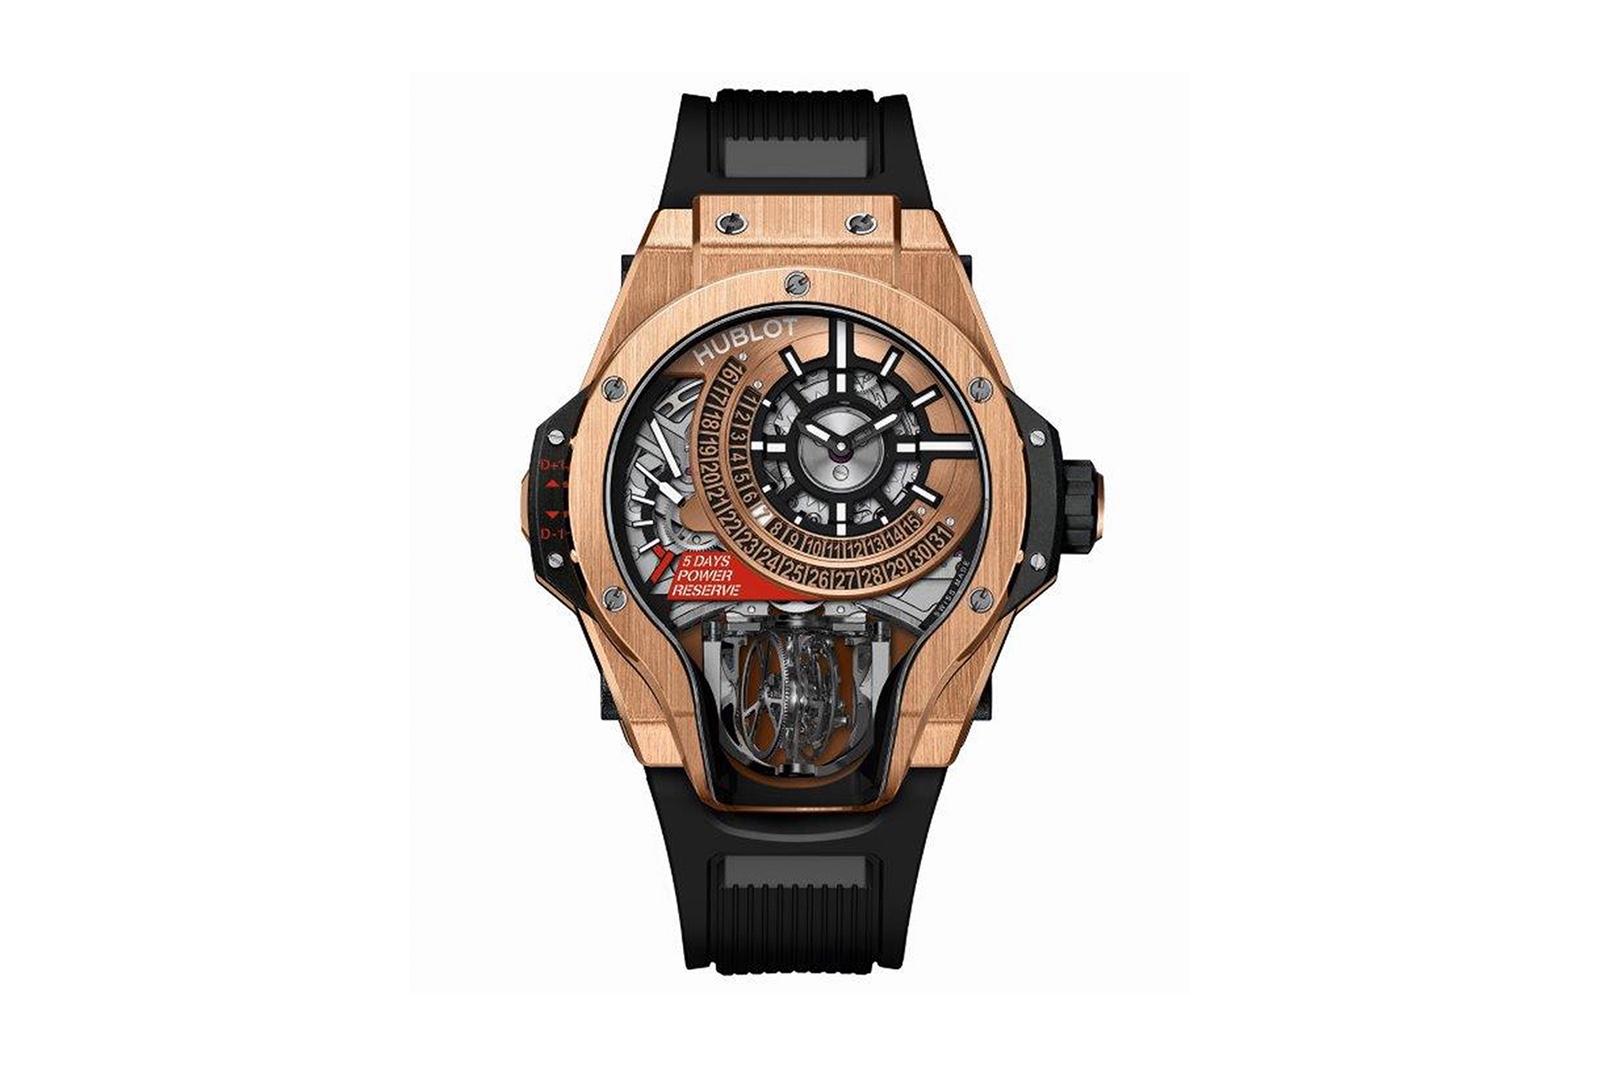 https-hypebeast.comimage201703hublot-mp-09-tourbillon-bi-axis-watch-4